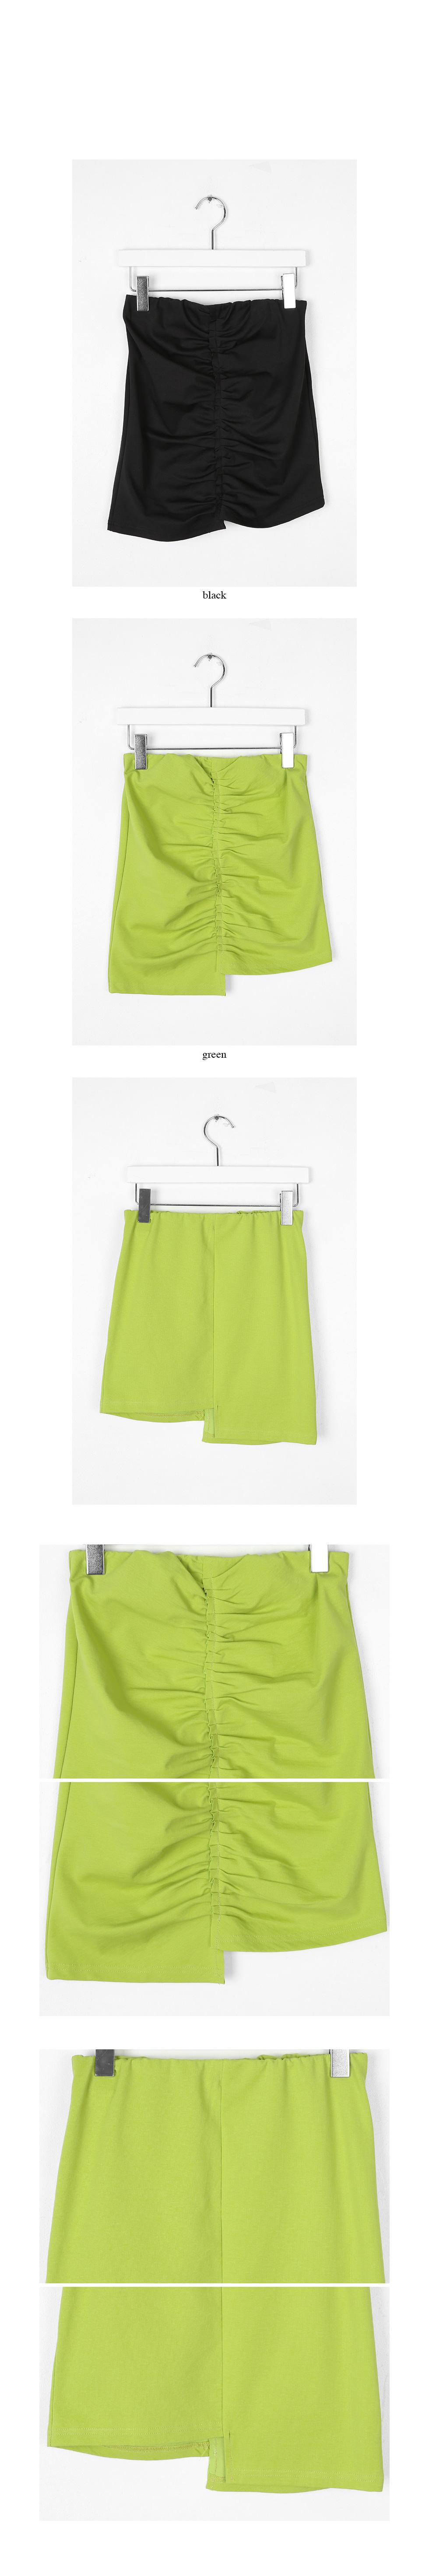 shirring tension banding skirts